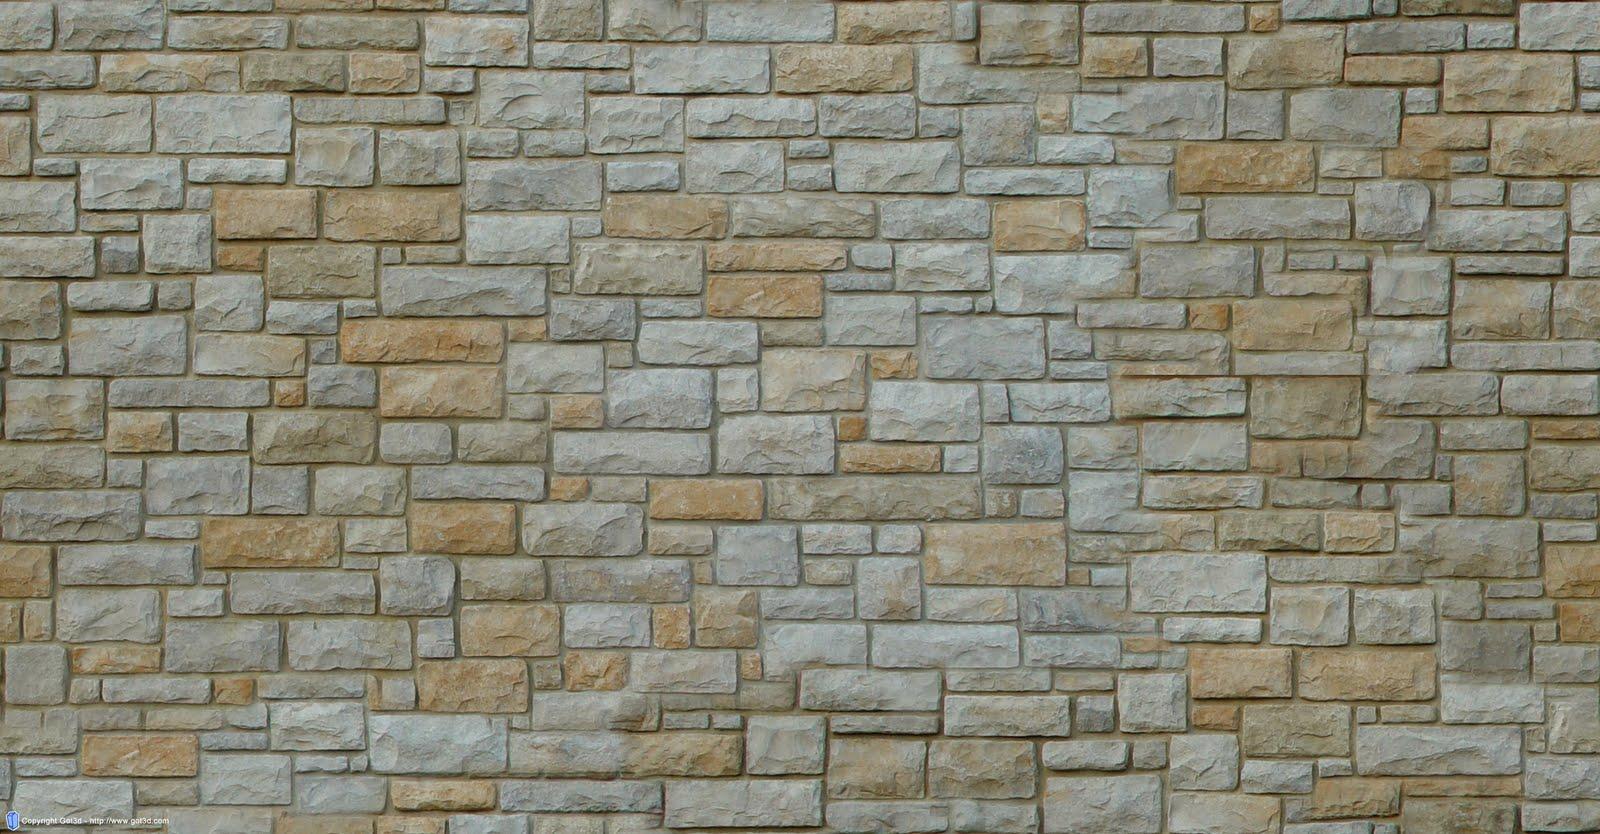 Fotograf a 3 texturas y paredes - Textura pared ...